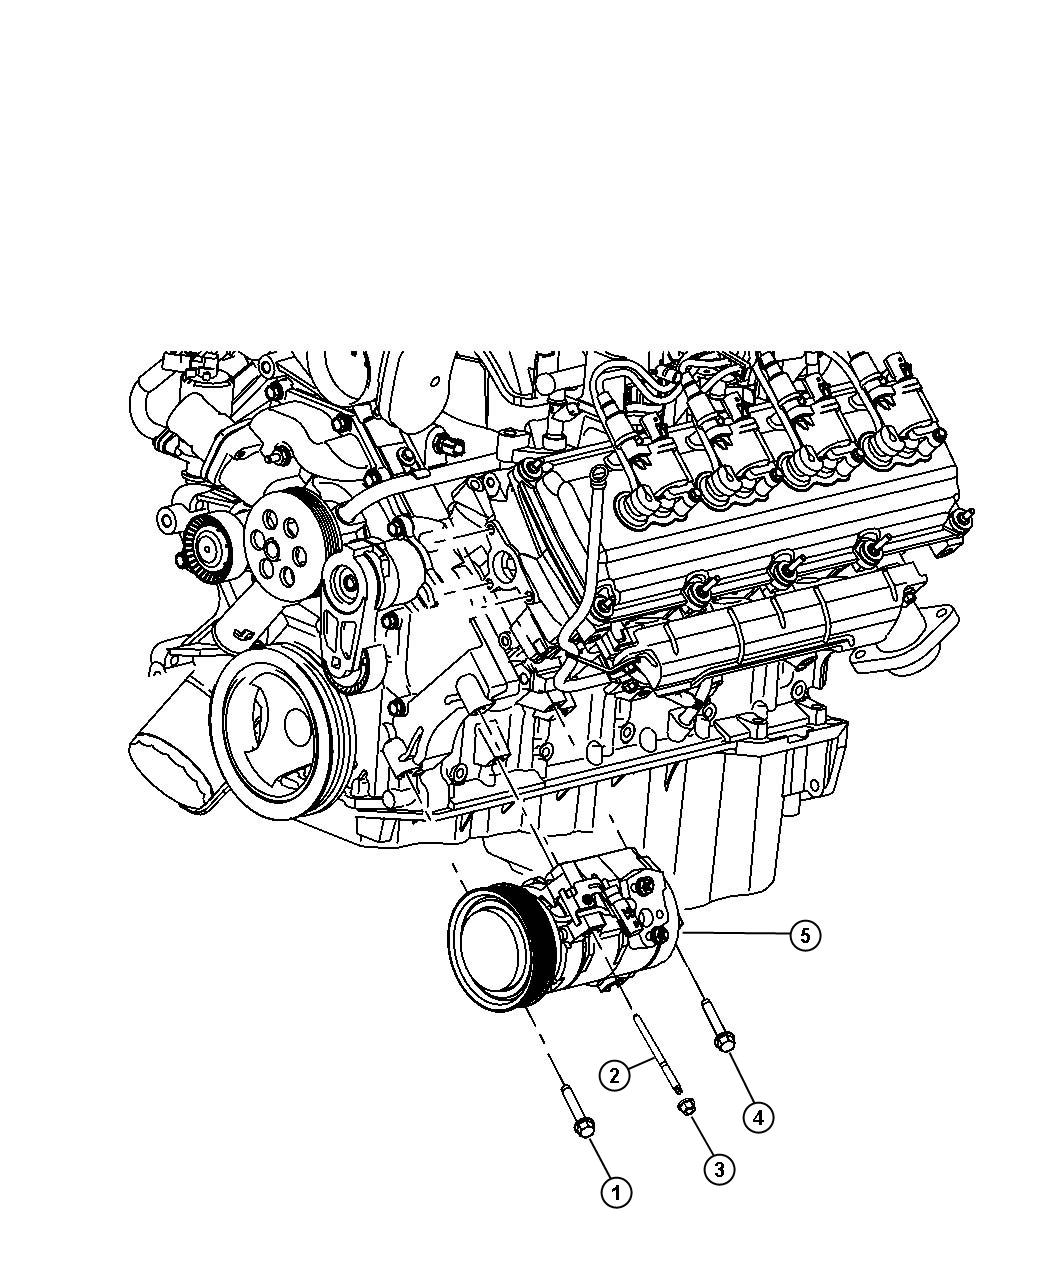 Dodge Durango Bolt Hex Flange Head M8 1 25x100